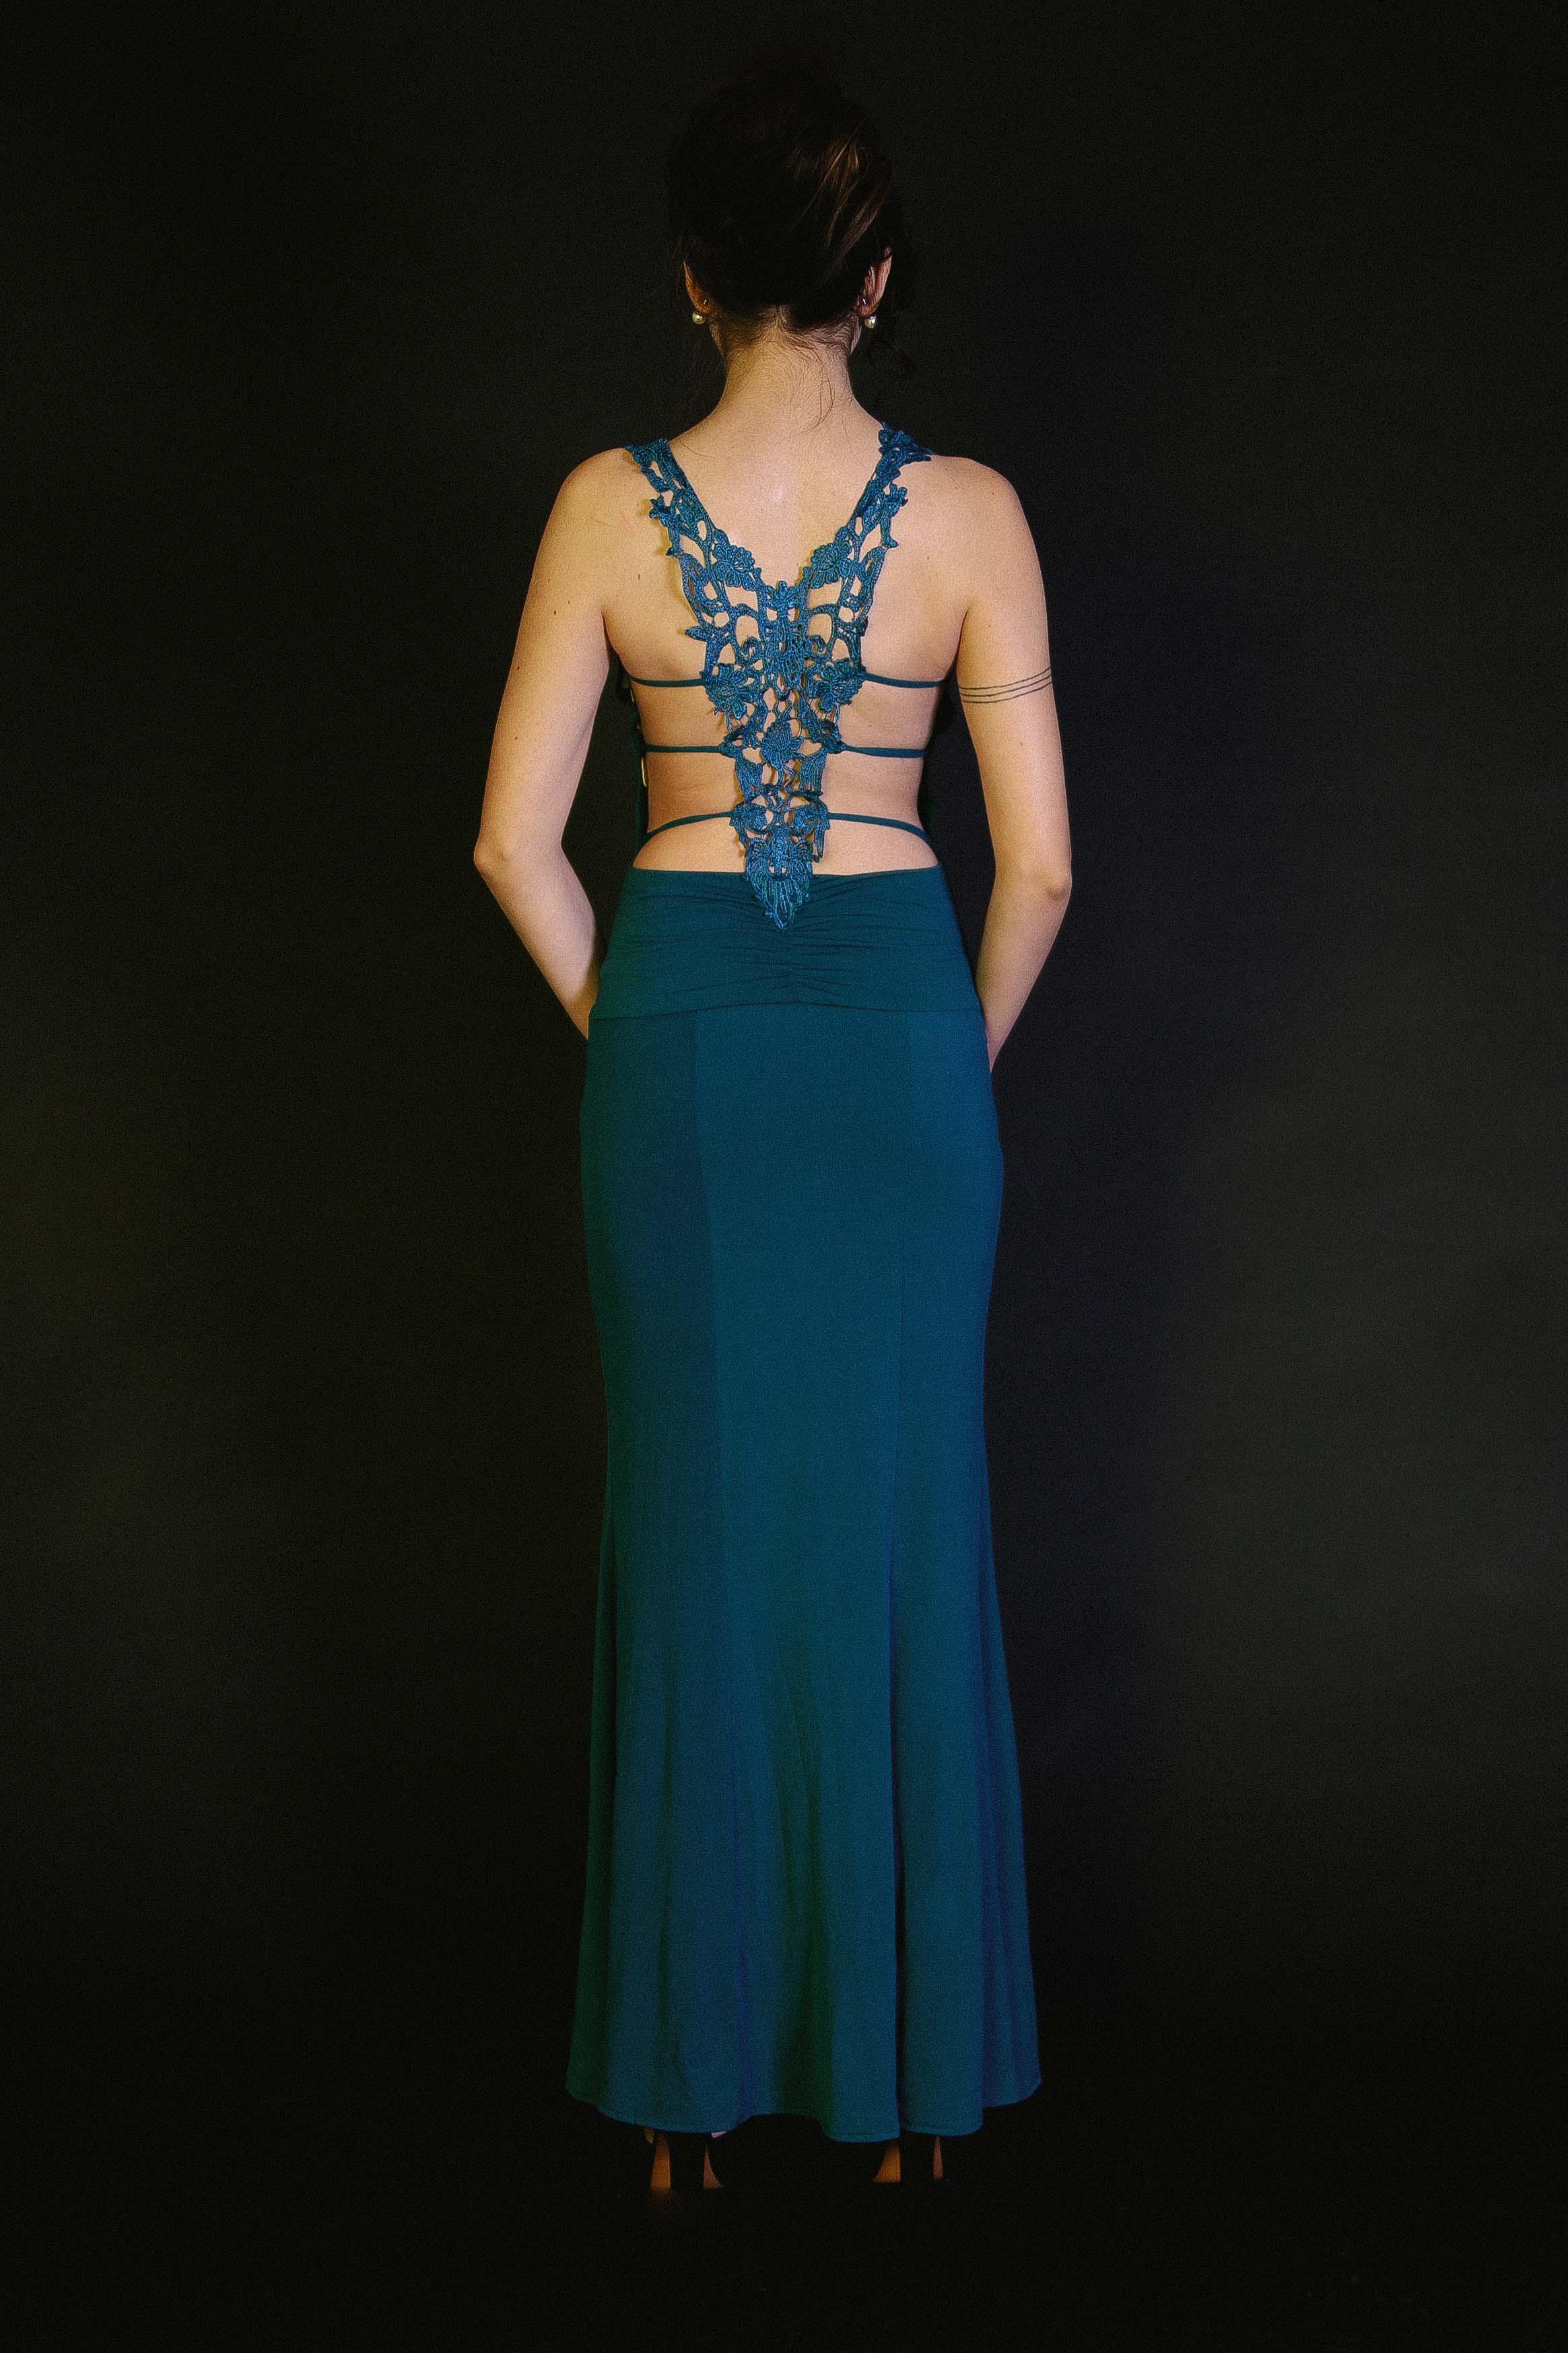 Vestido Sirena Espalda Detalle